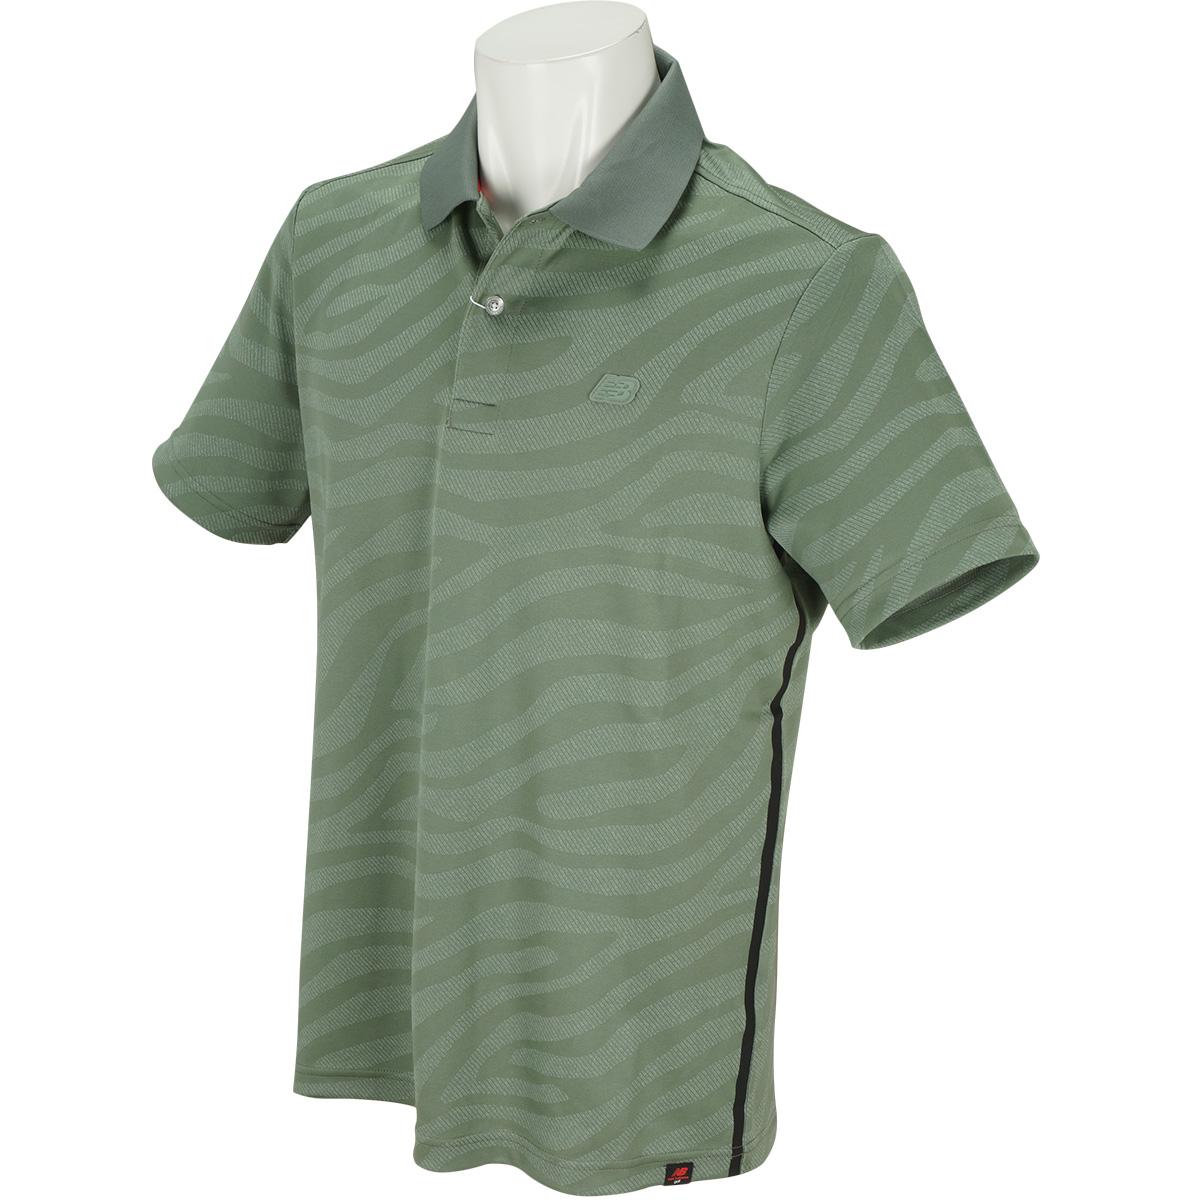 SPORT ゼブラ半袖ポロシャツ